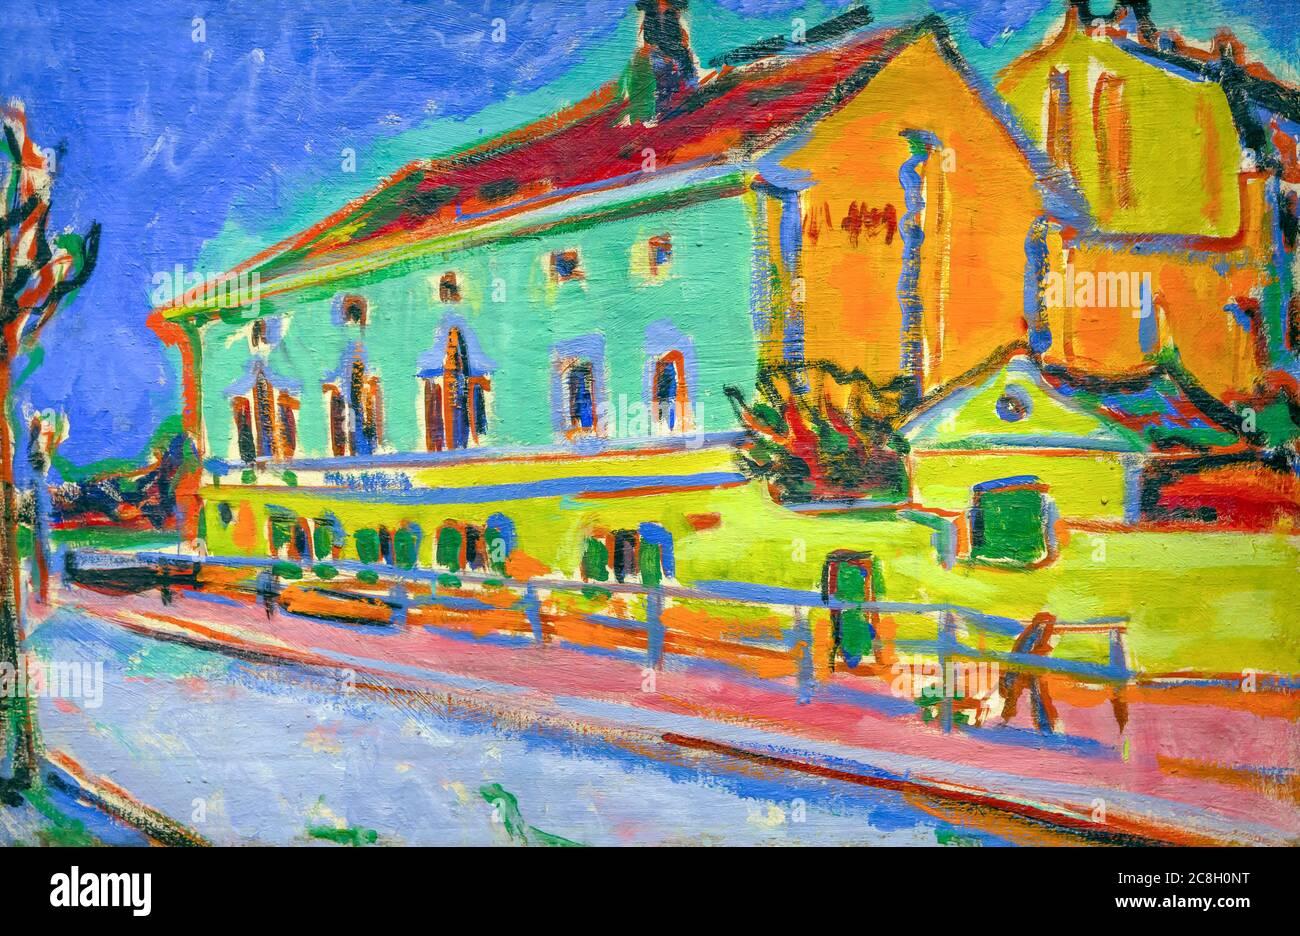 Dance Hall Bellevue, (anverso), Ernst Ludwig Kirchner, 1909-1910, National Gallery of Art, Washington DC, EE.UU., Norteamérica Foto de stock